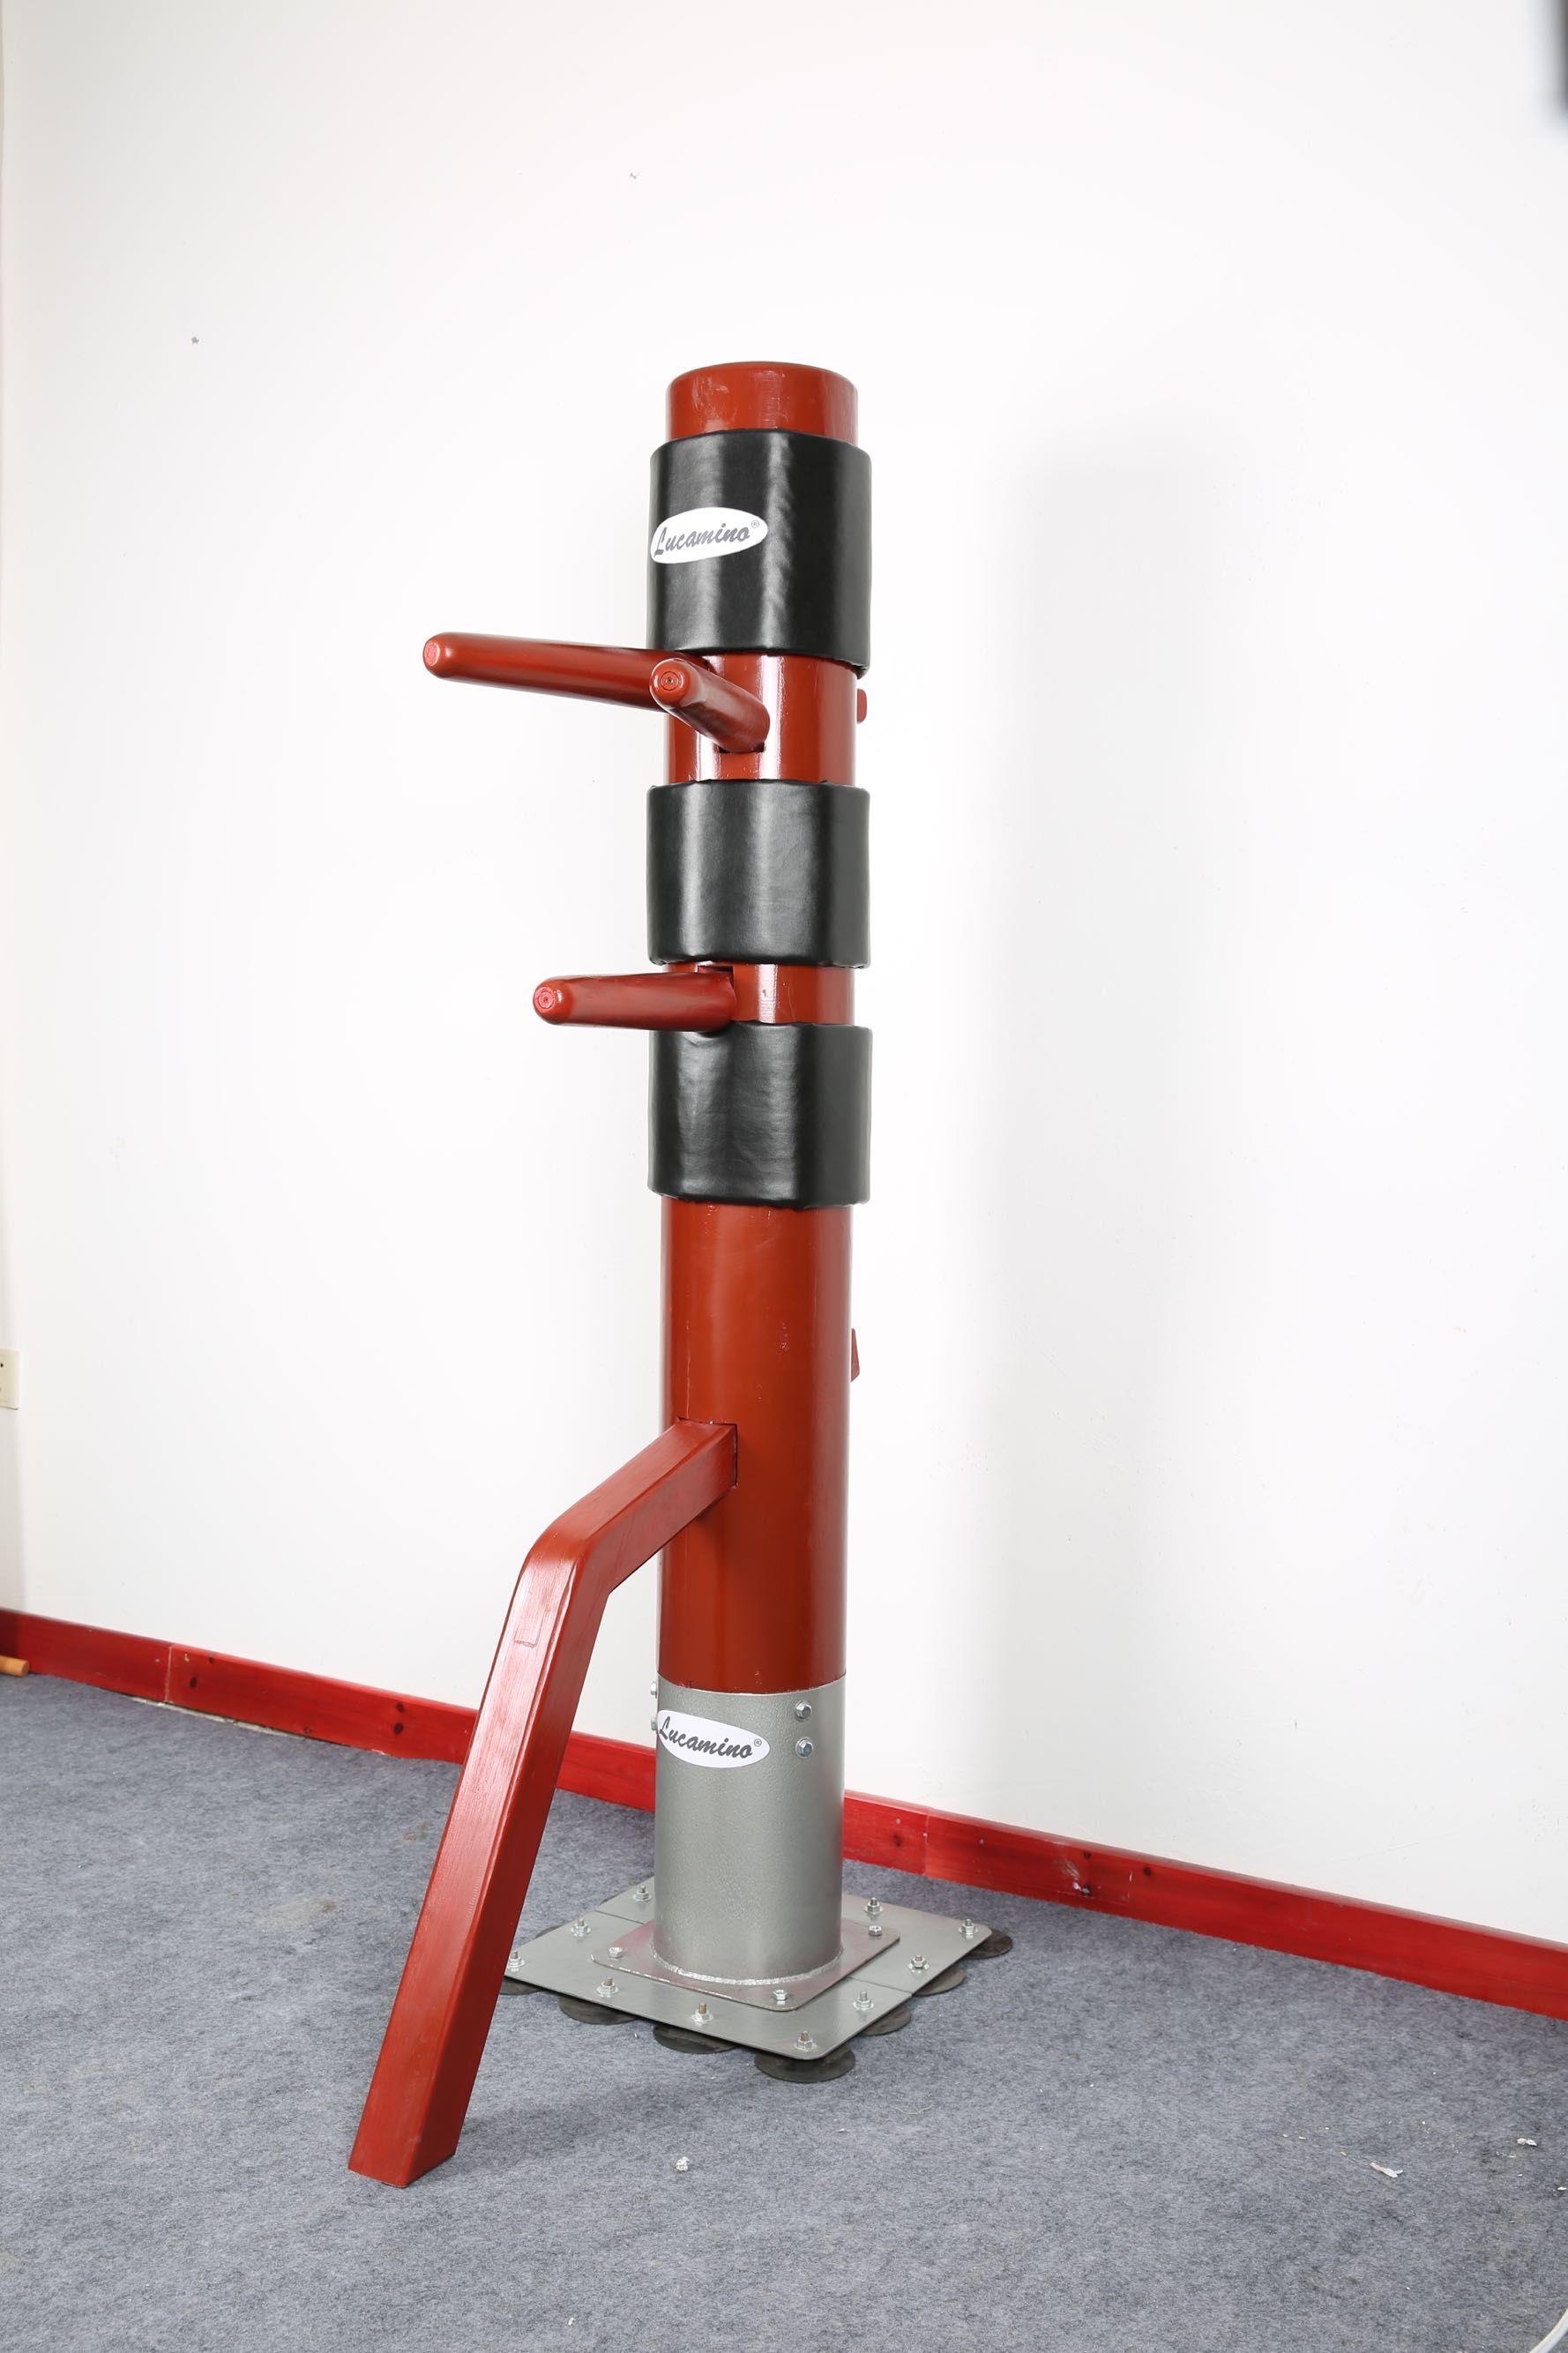 Factory Direct Patent Stand Column Wing Chun Wooden Dummyone Punch Man Kung Fu Training Mook Jongip Man Martial Arts Retailwholesale